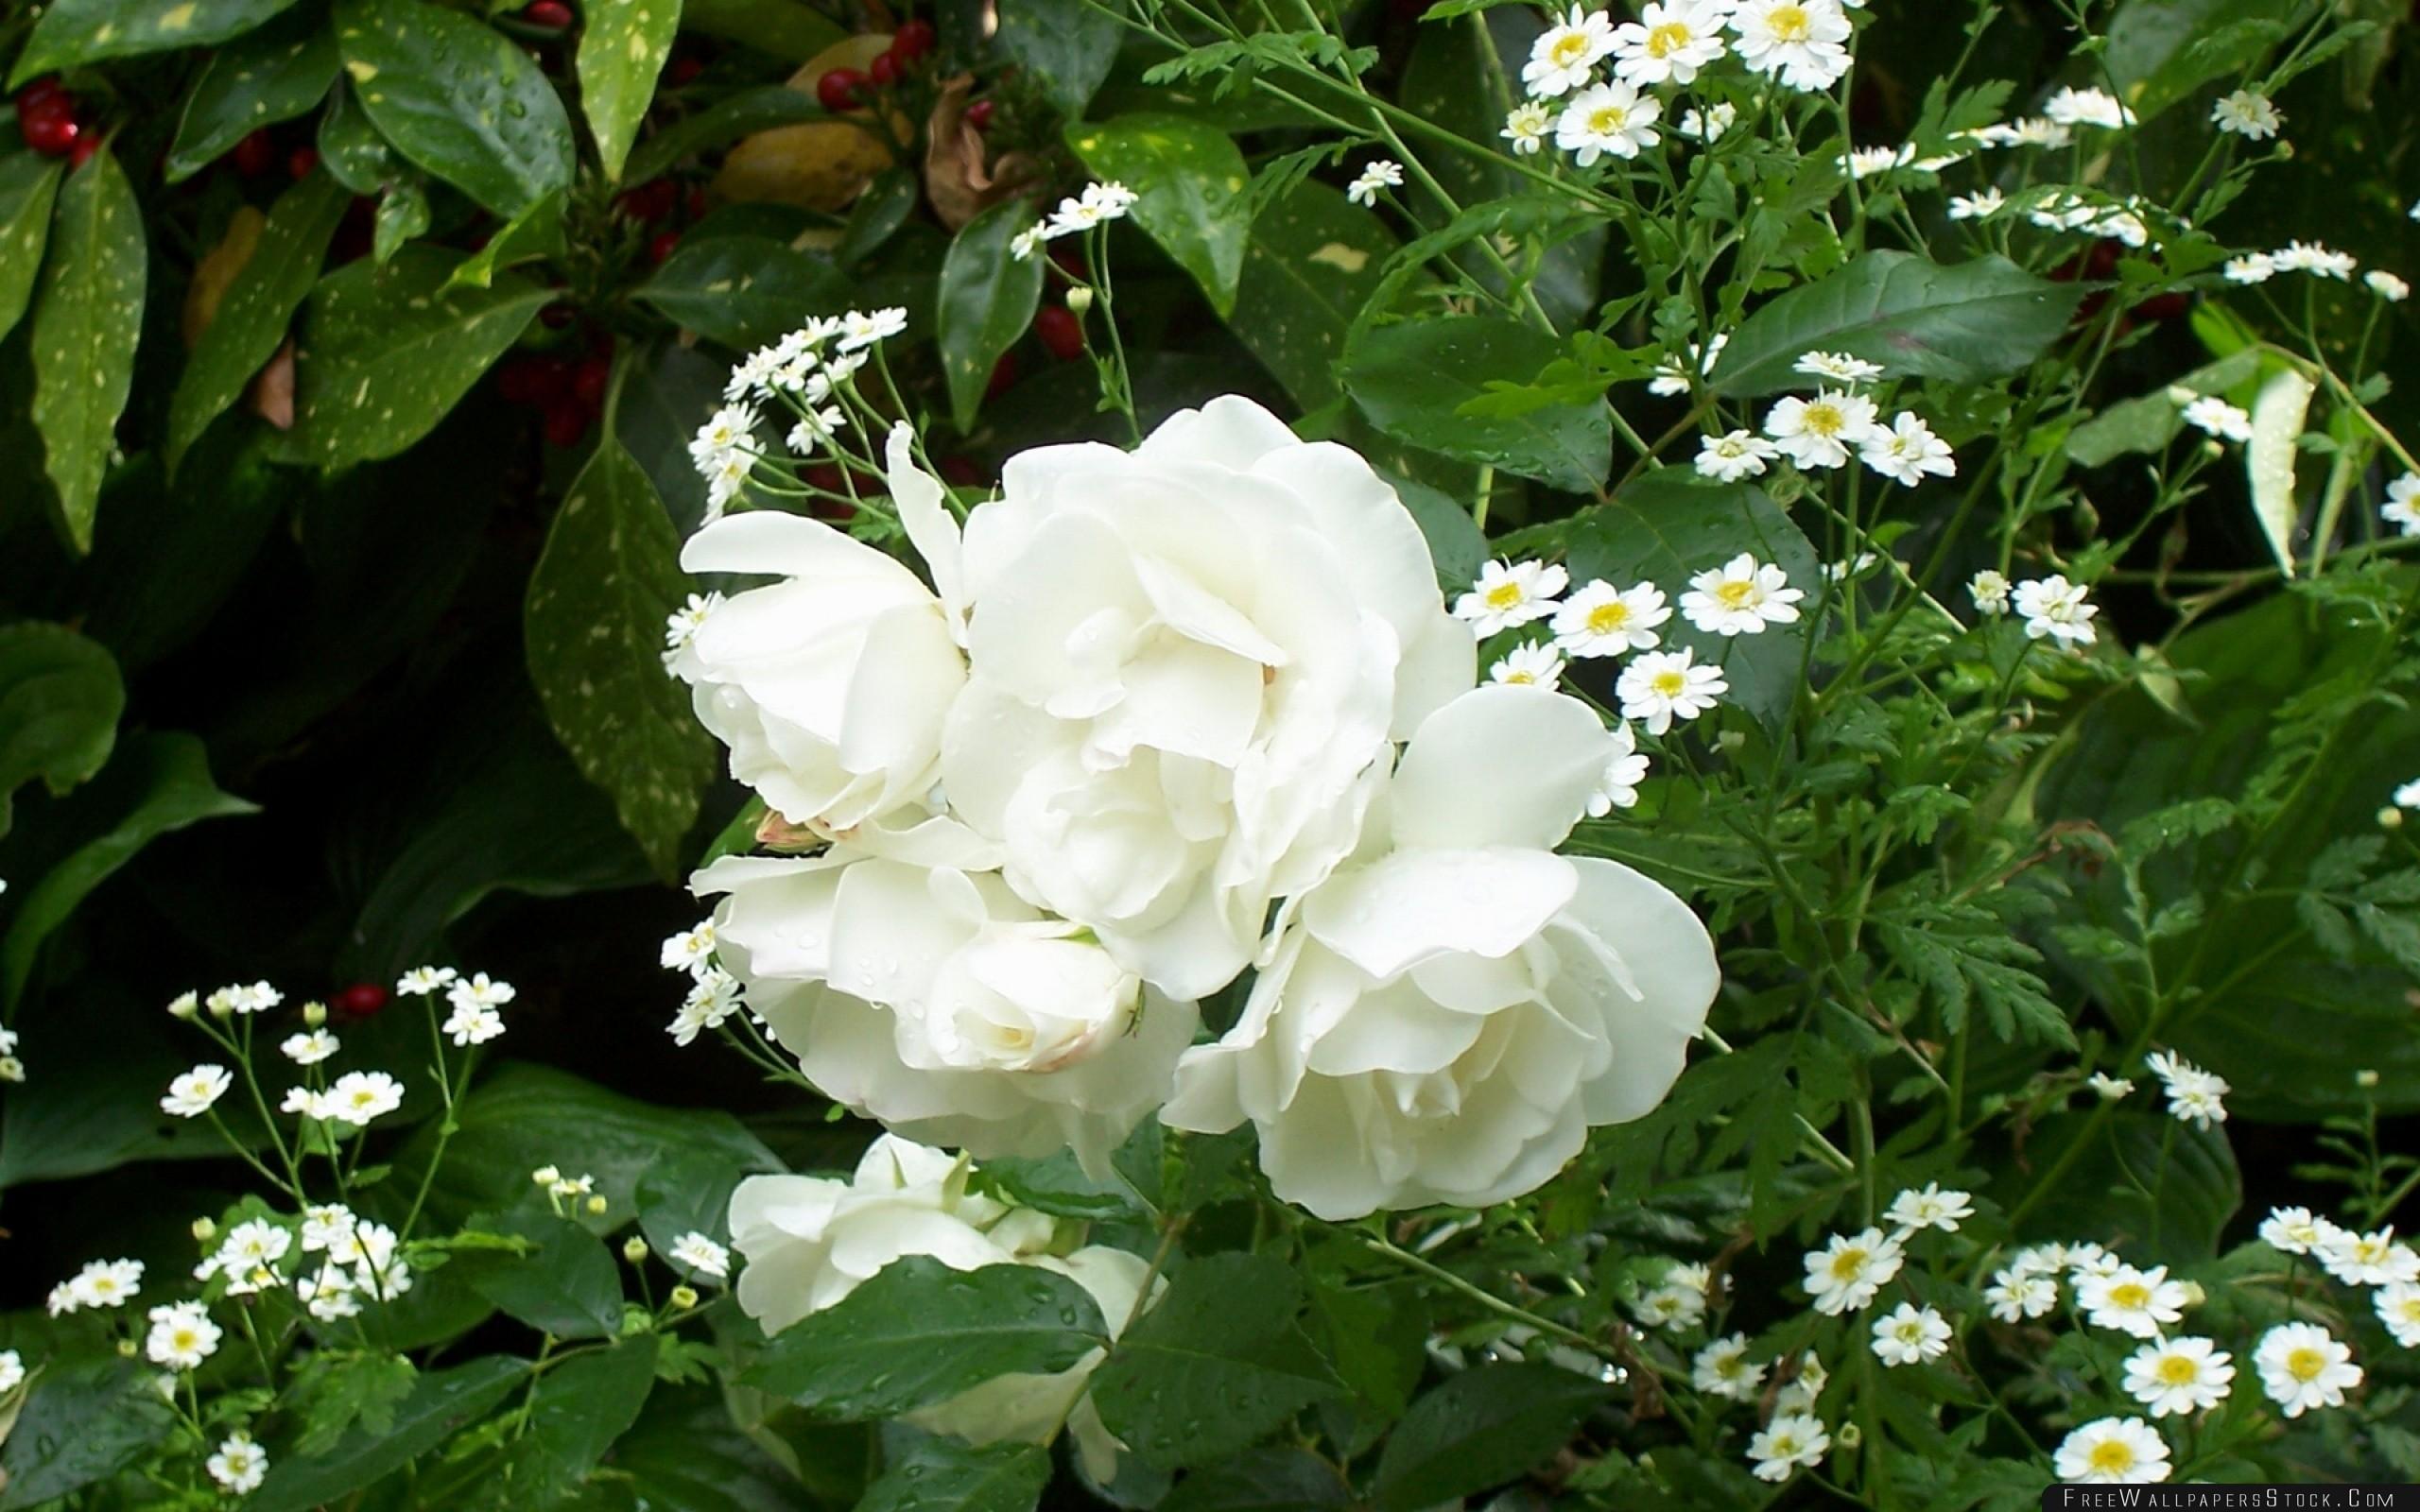 Download Free Wallpaper Rose White Bush Green Drop Freshness